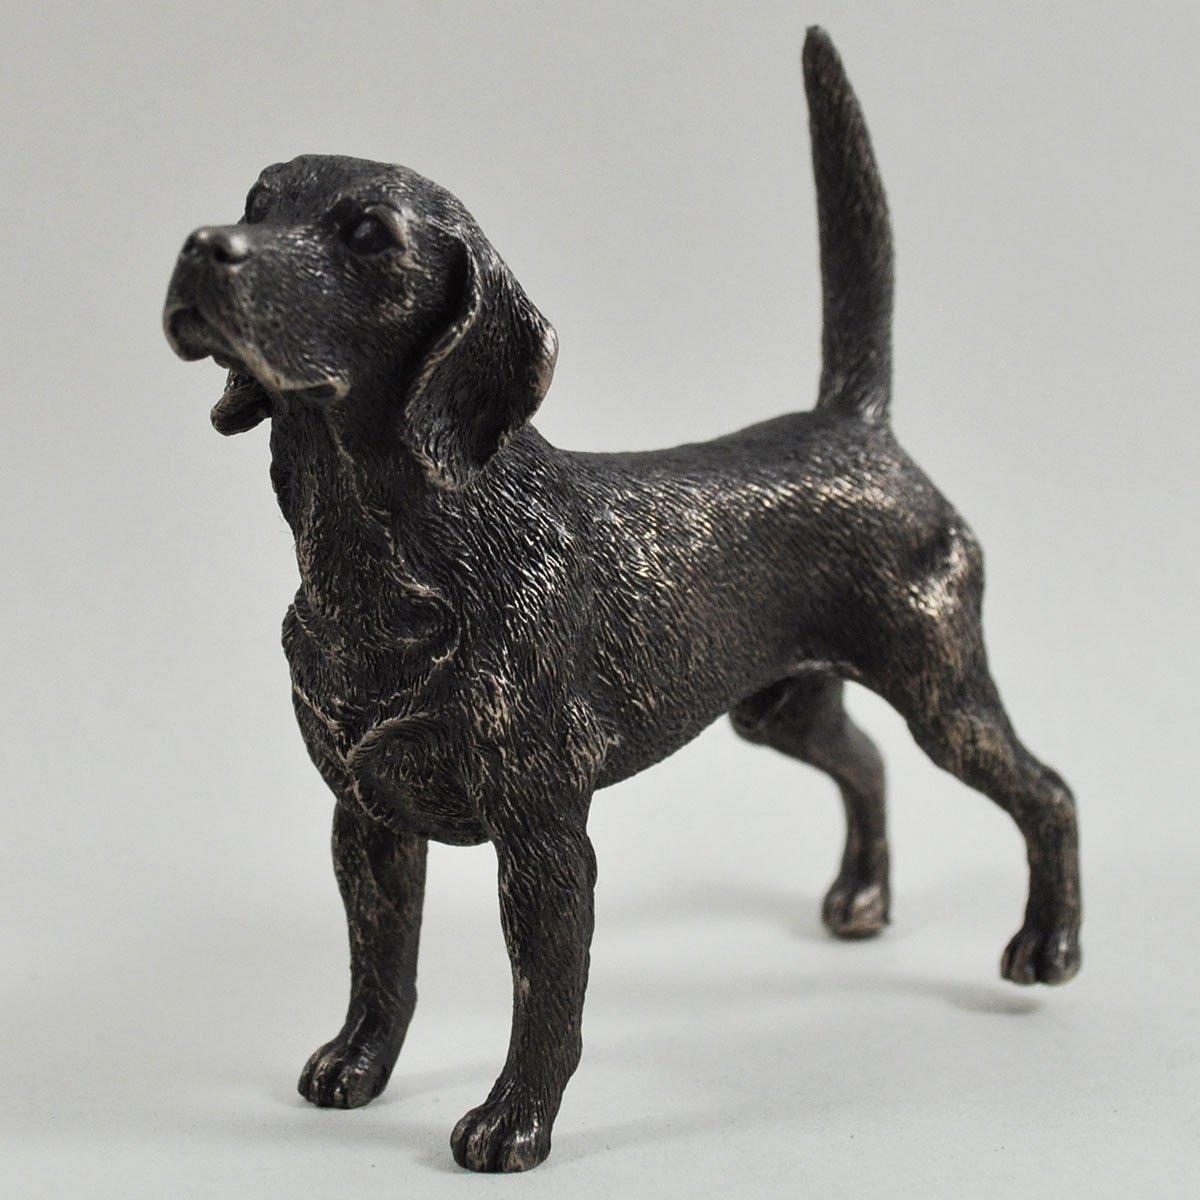 Fiesta Studios Beagle Standing Small Cold Cast Bronze Statue Sculpture Dog Pets Gift Idea H9cm